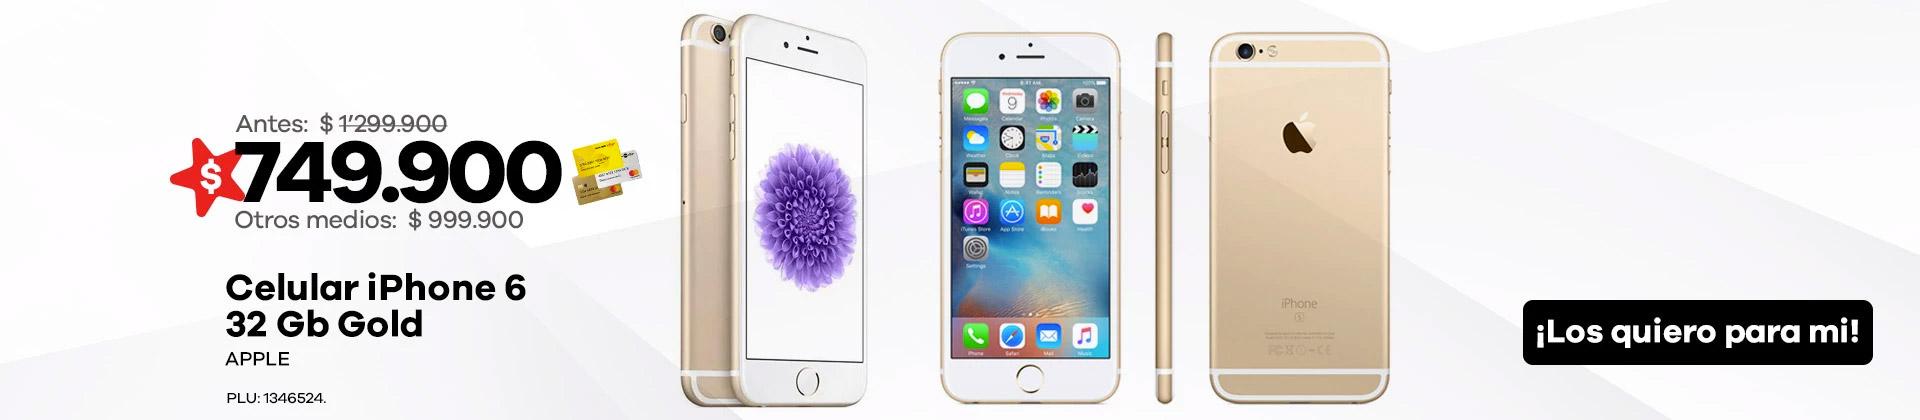 iphone-6-de-32-gb-gold